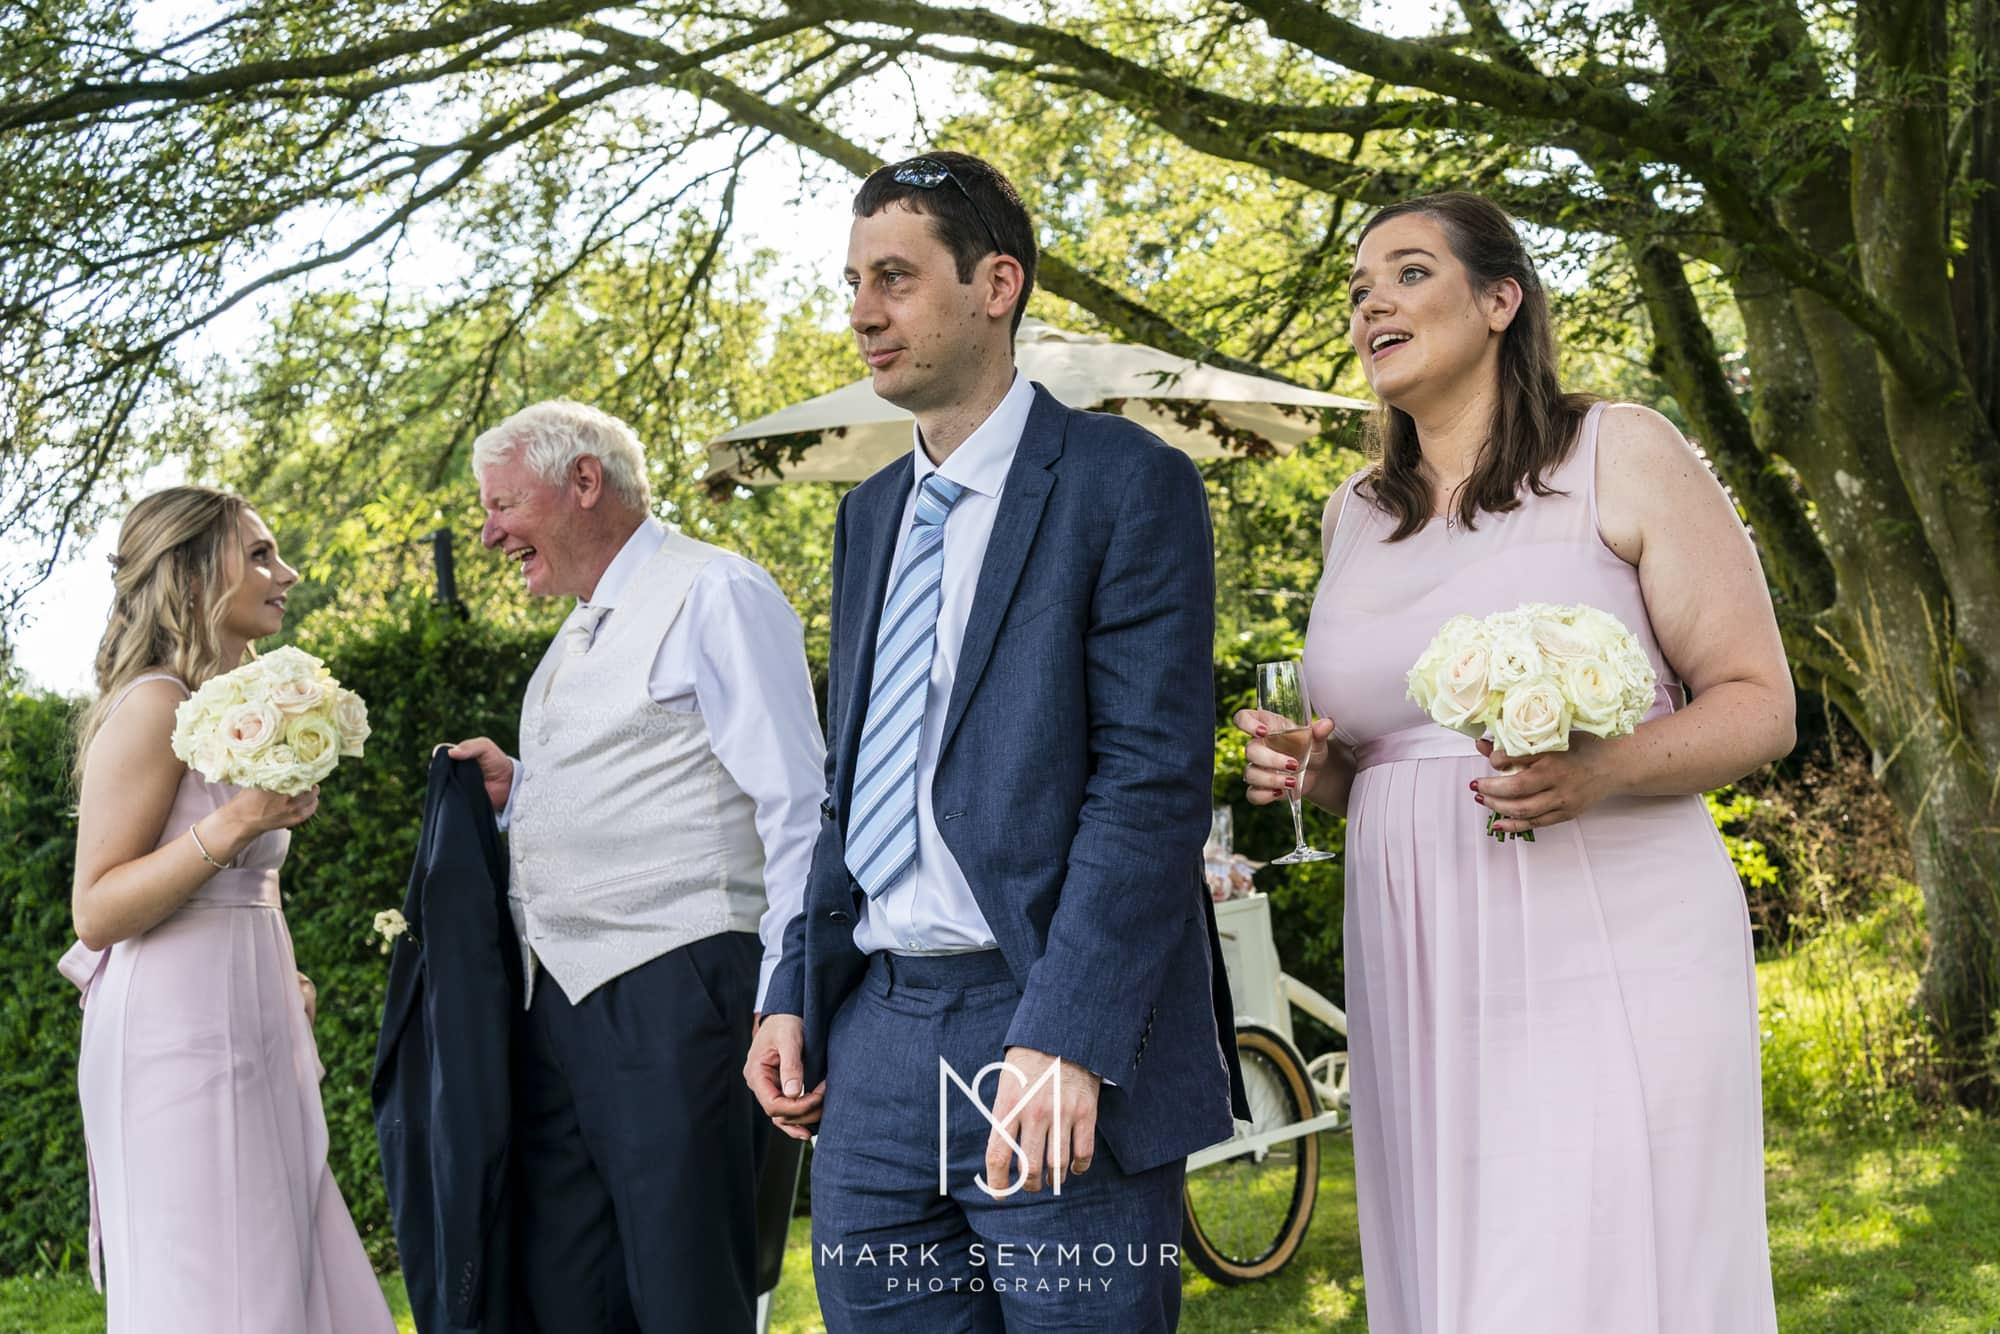 Barnsley House Wedding Photographer - Olivia and James' wedding 23